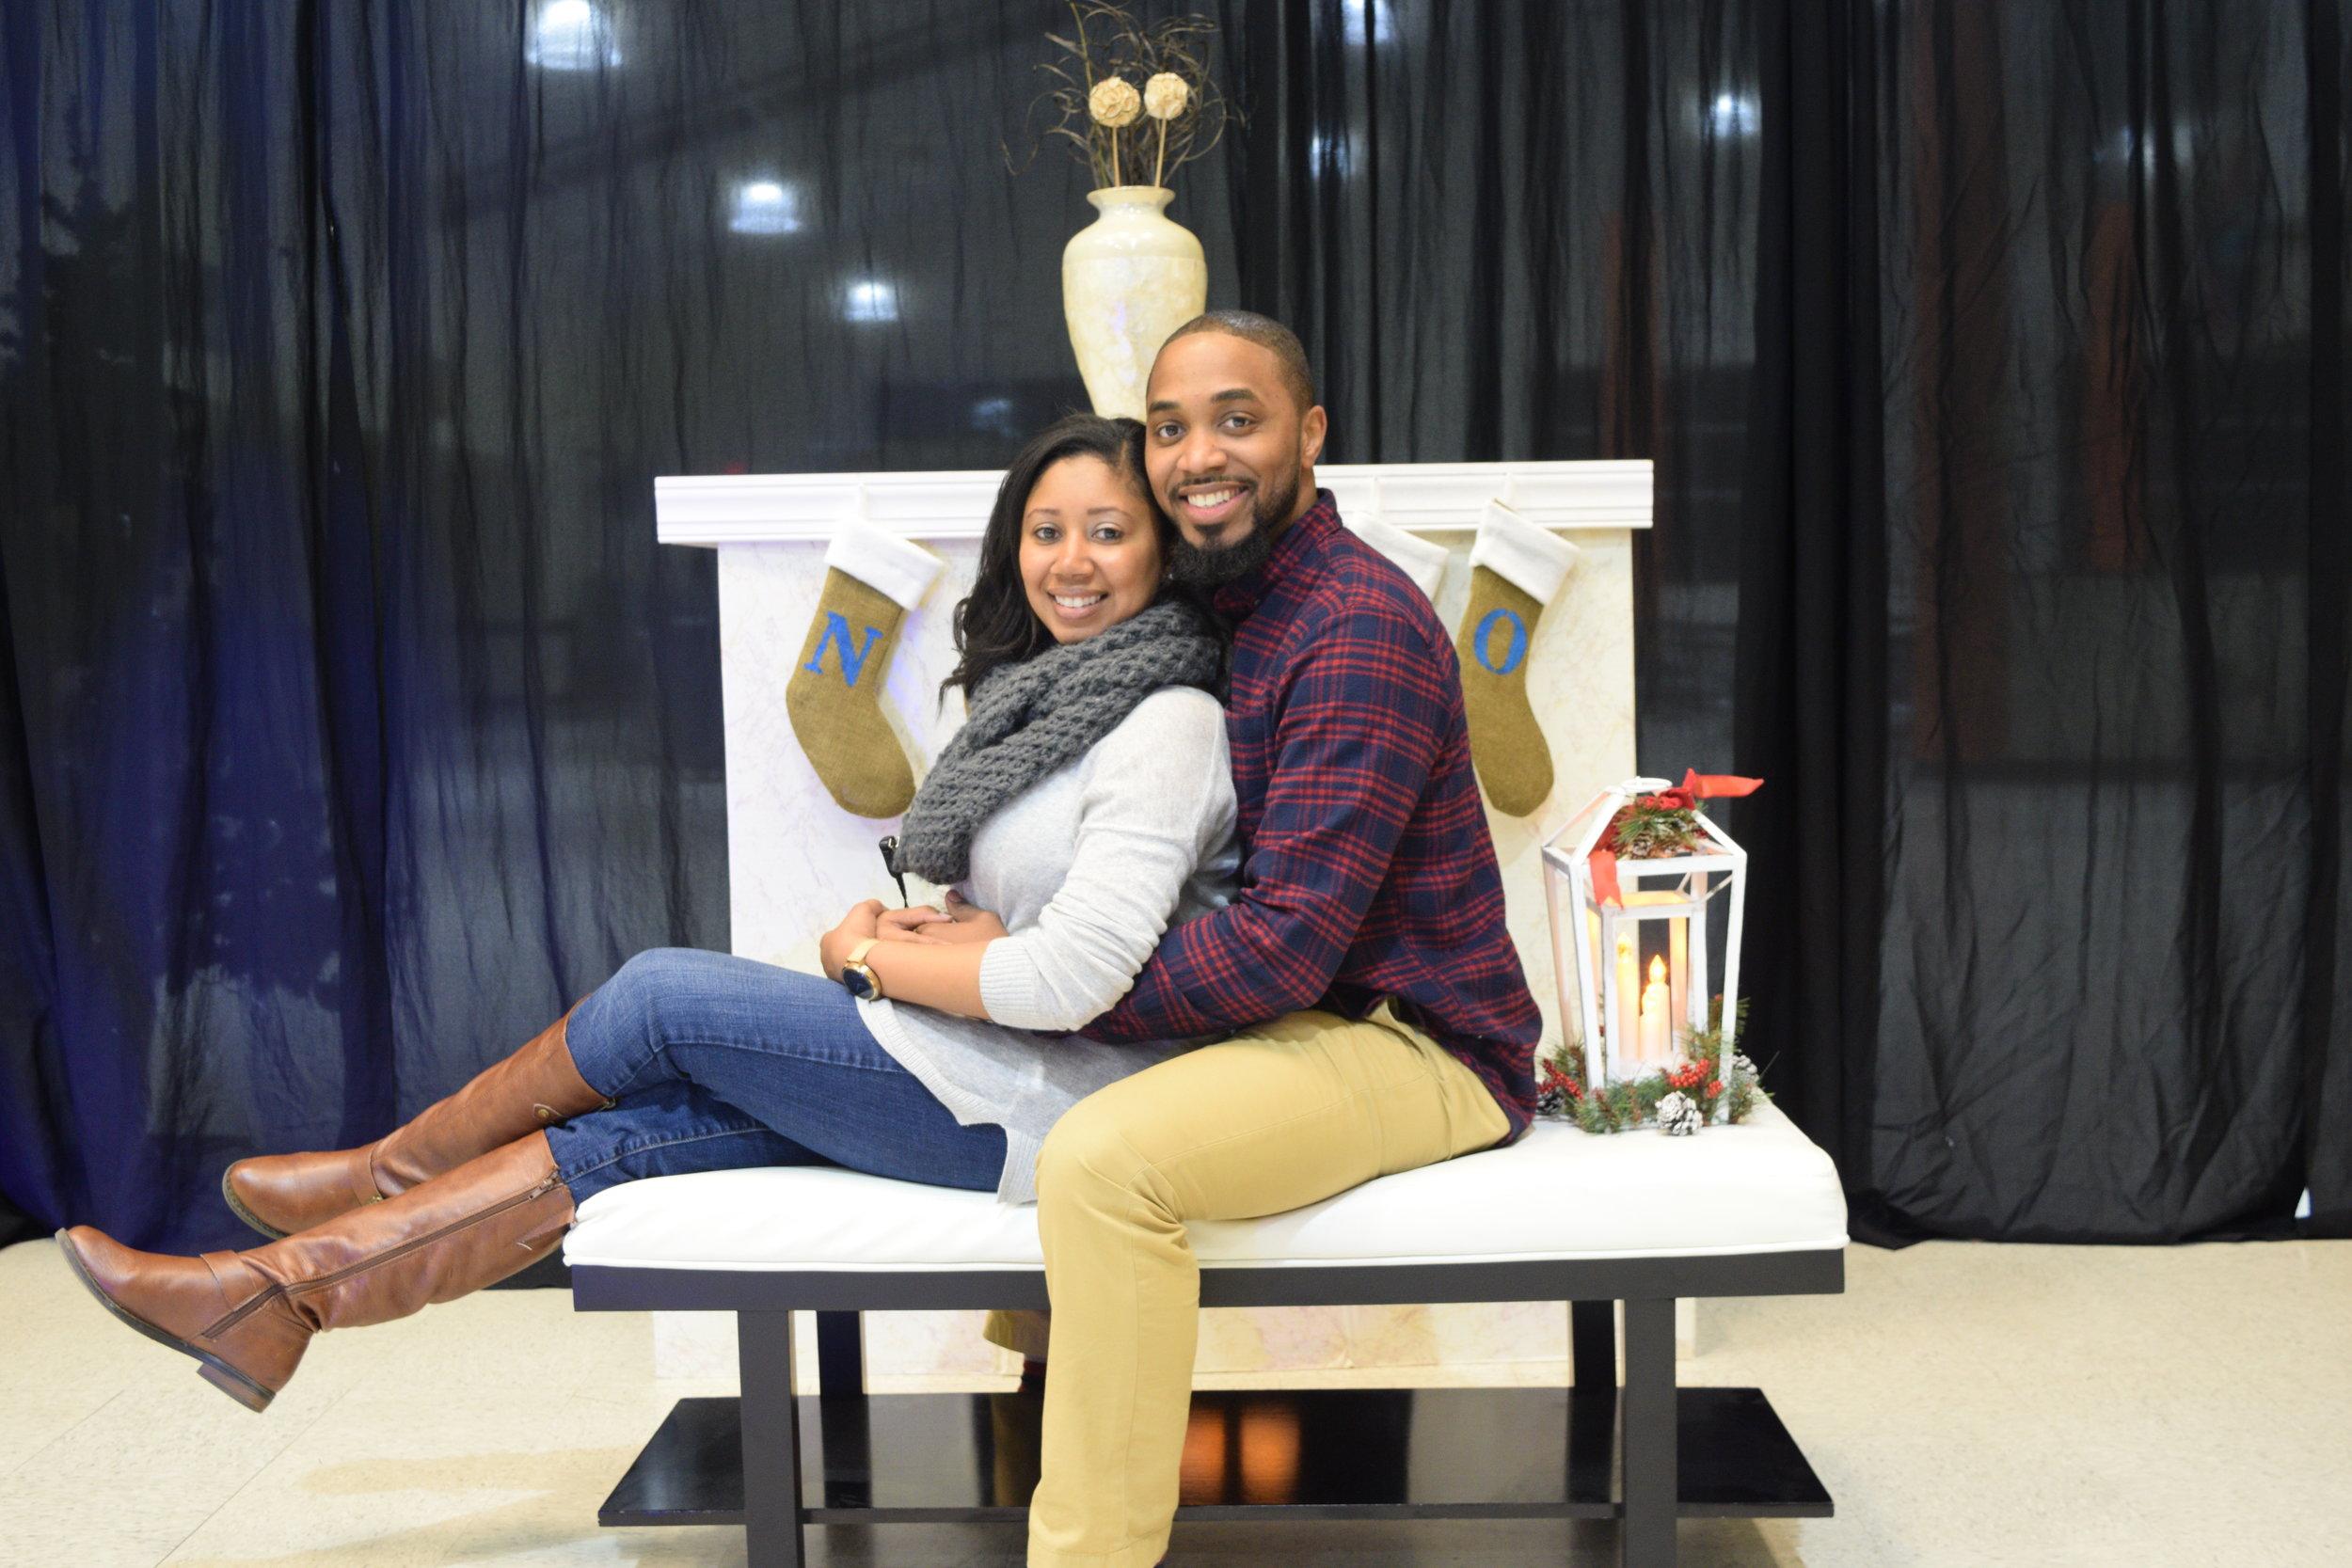 16. Mr. & Mrs. Brown